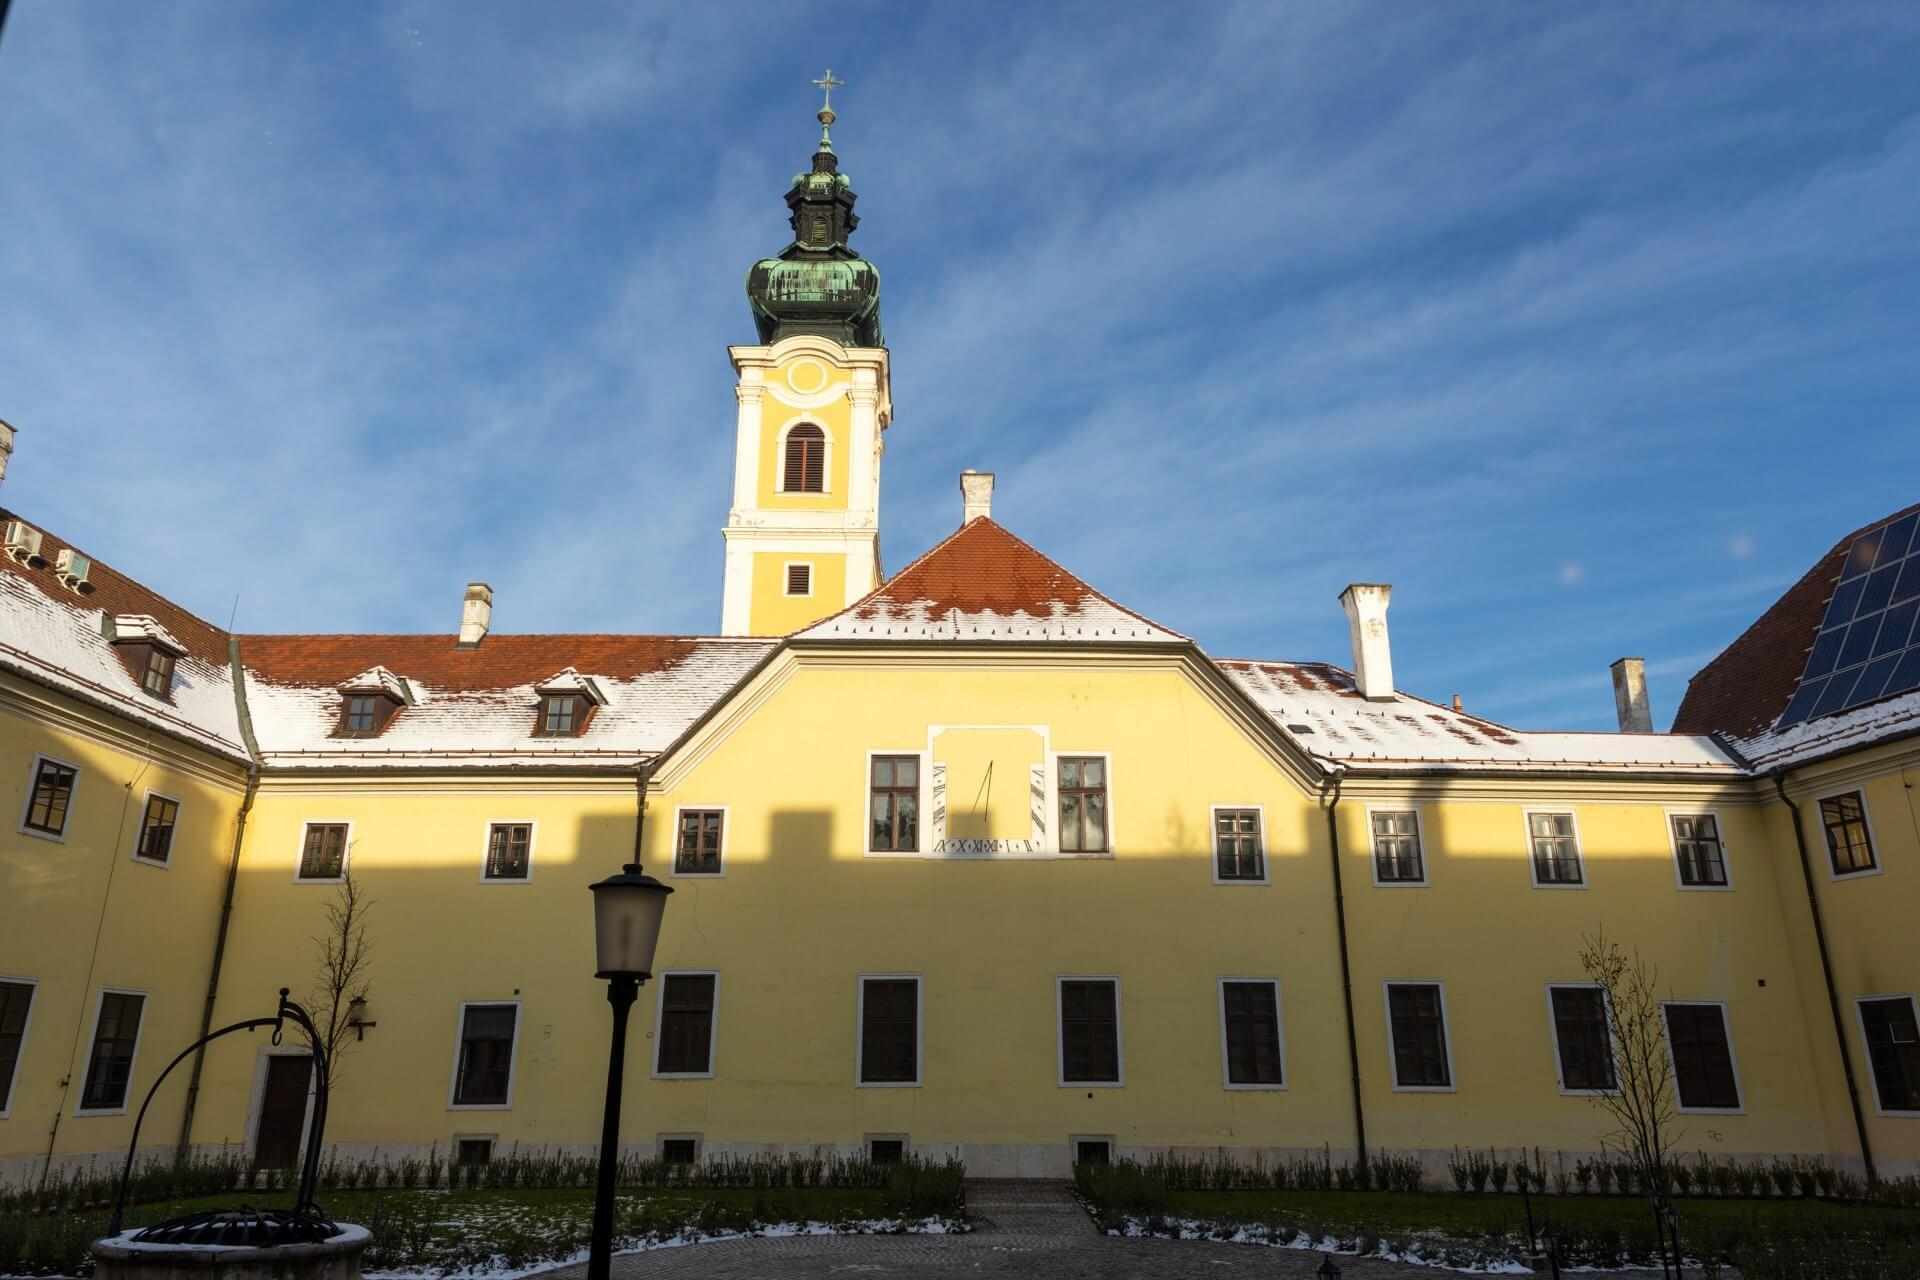 Innenhof vom Klastrum Hotel in Győr